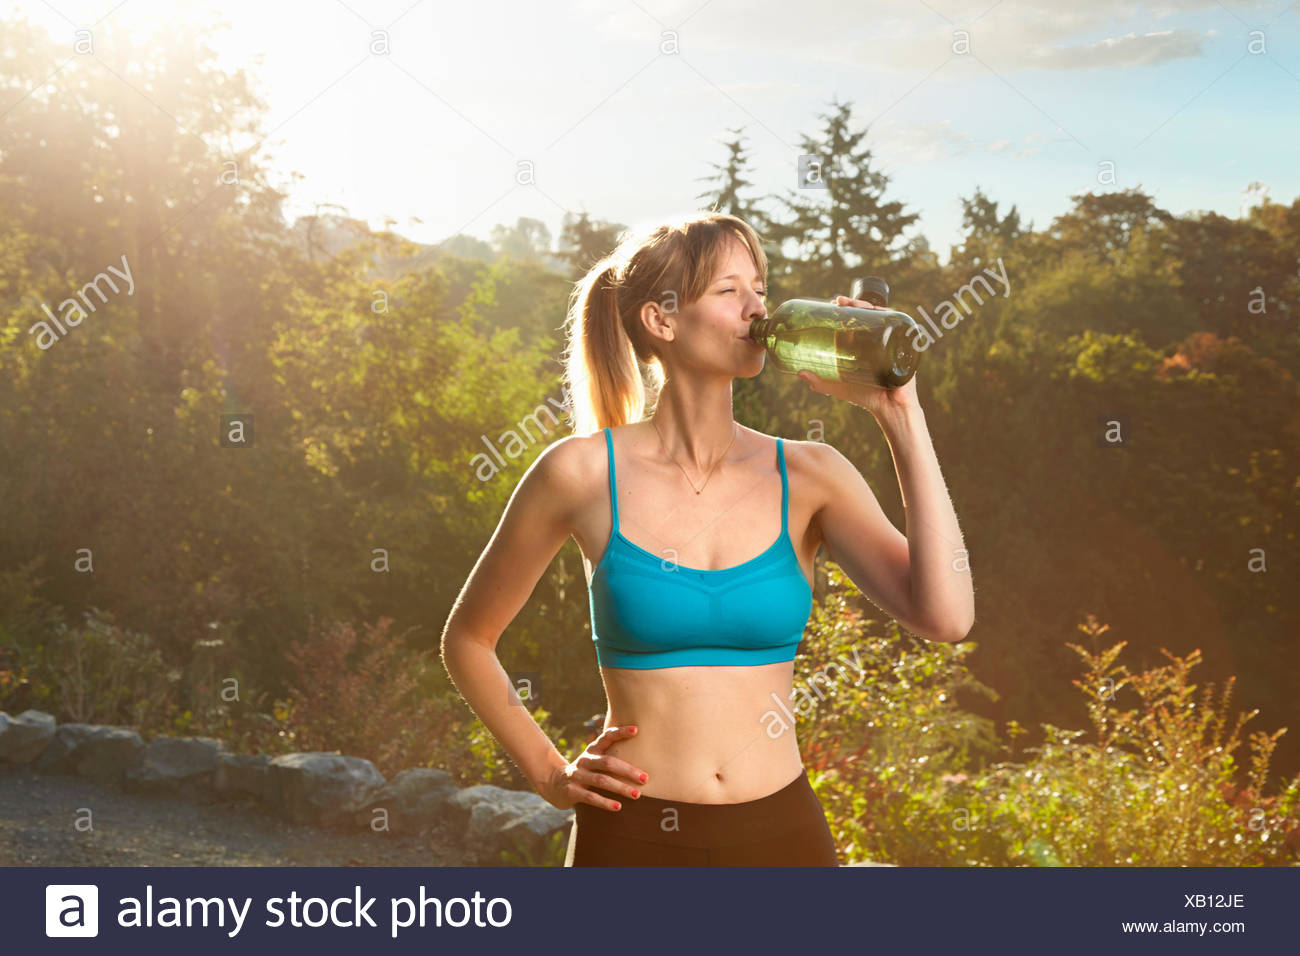 Mid adult female runner taking a water break in park - Stock Image